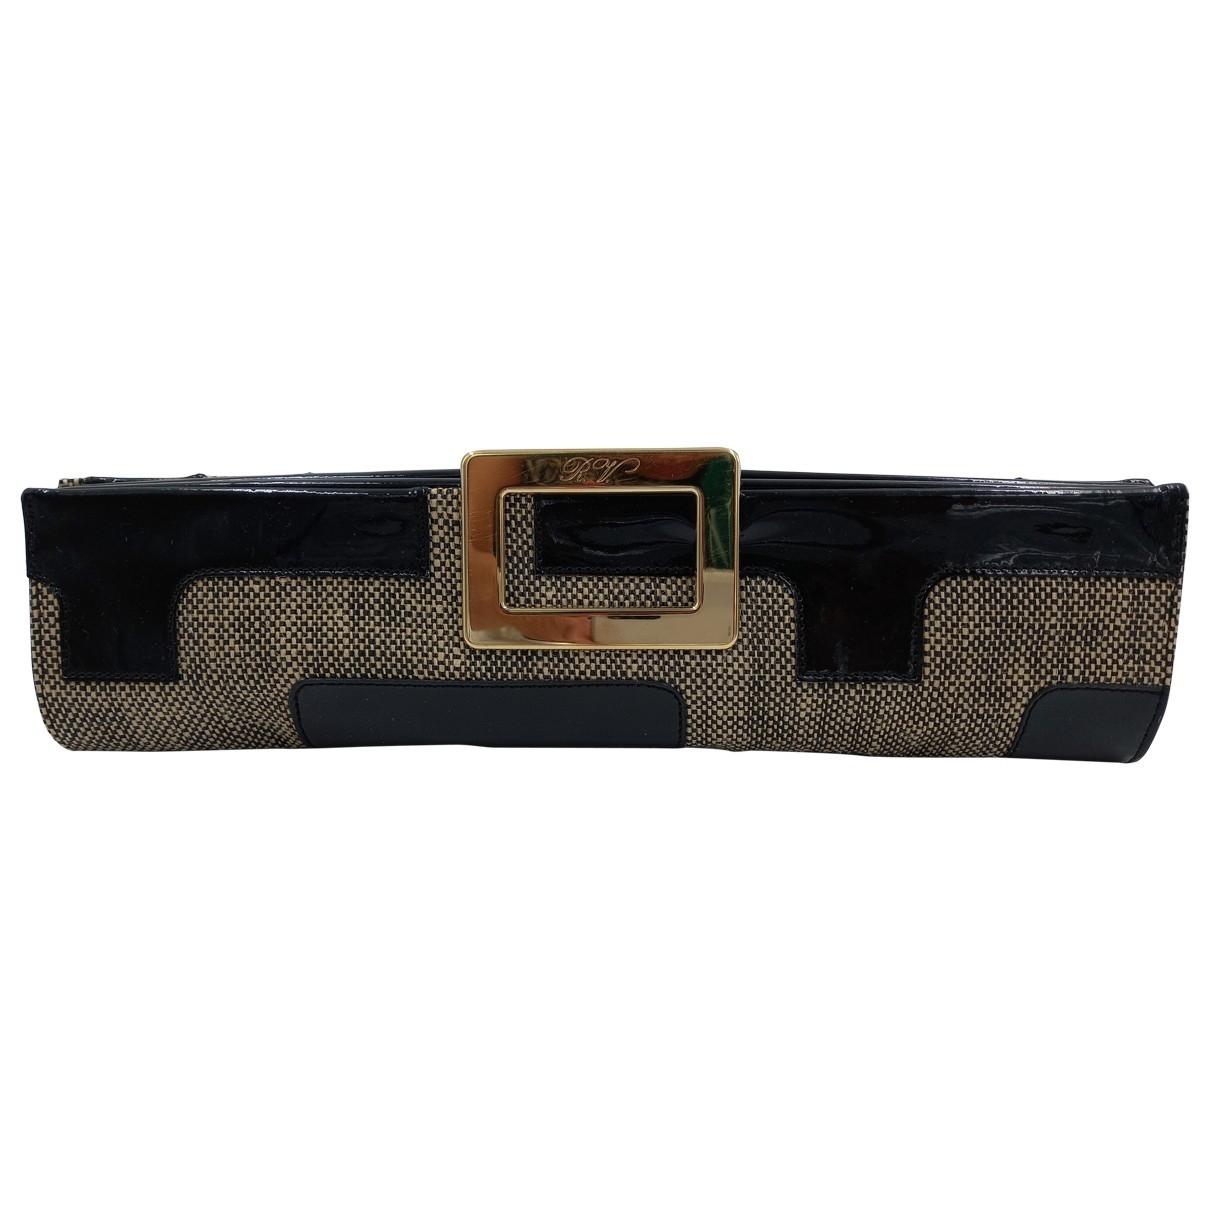 Roger Vivier \N Black Patent leather Clutch bag for Women \N